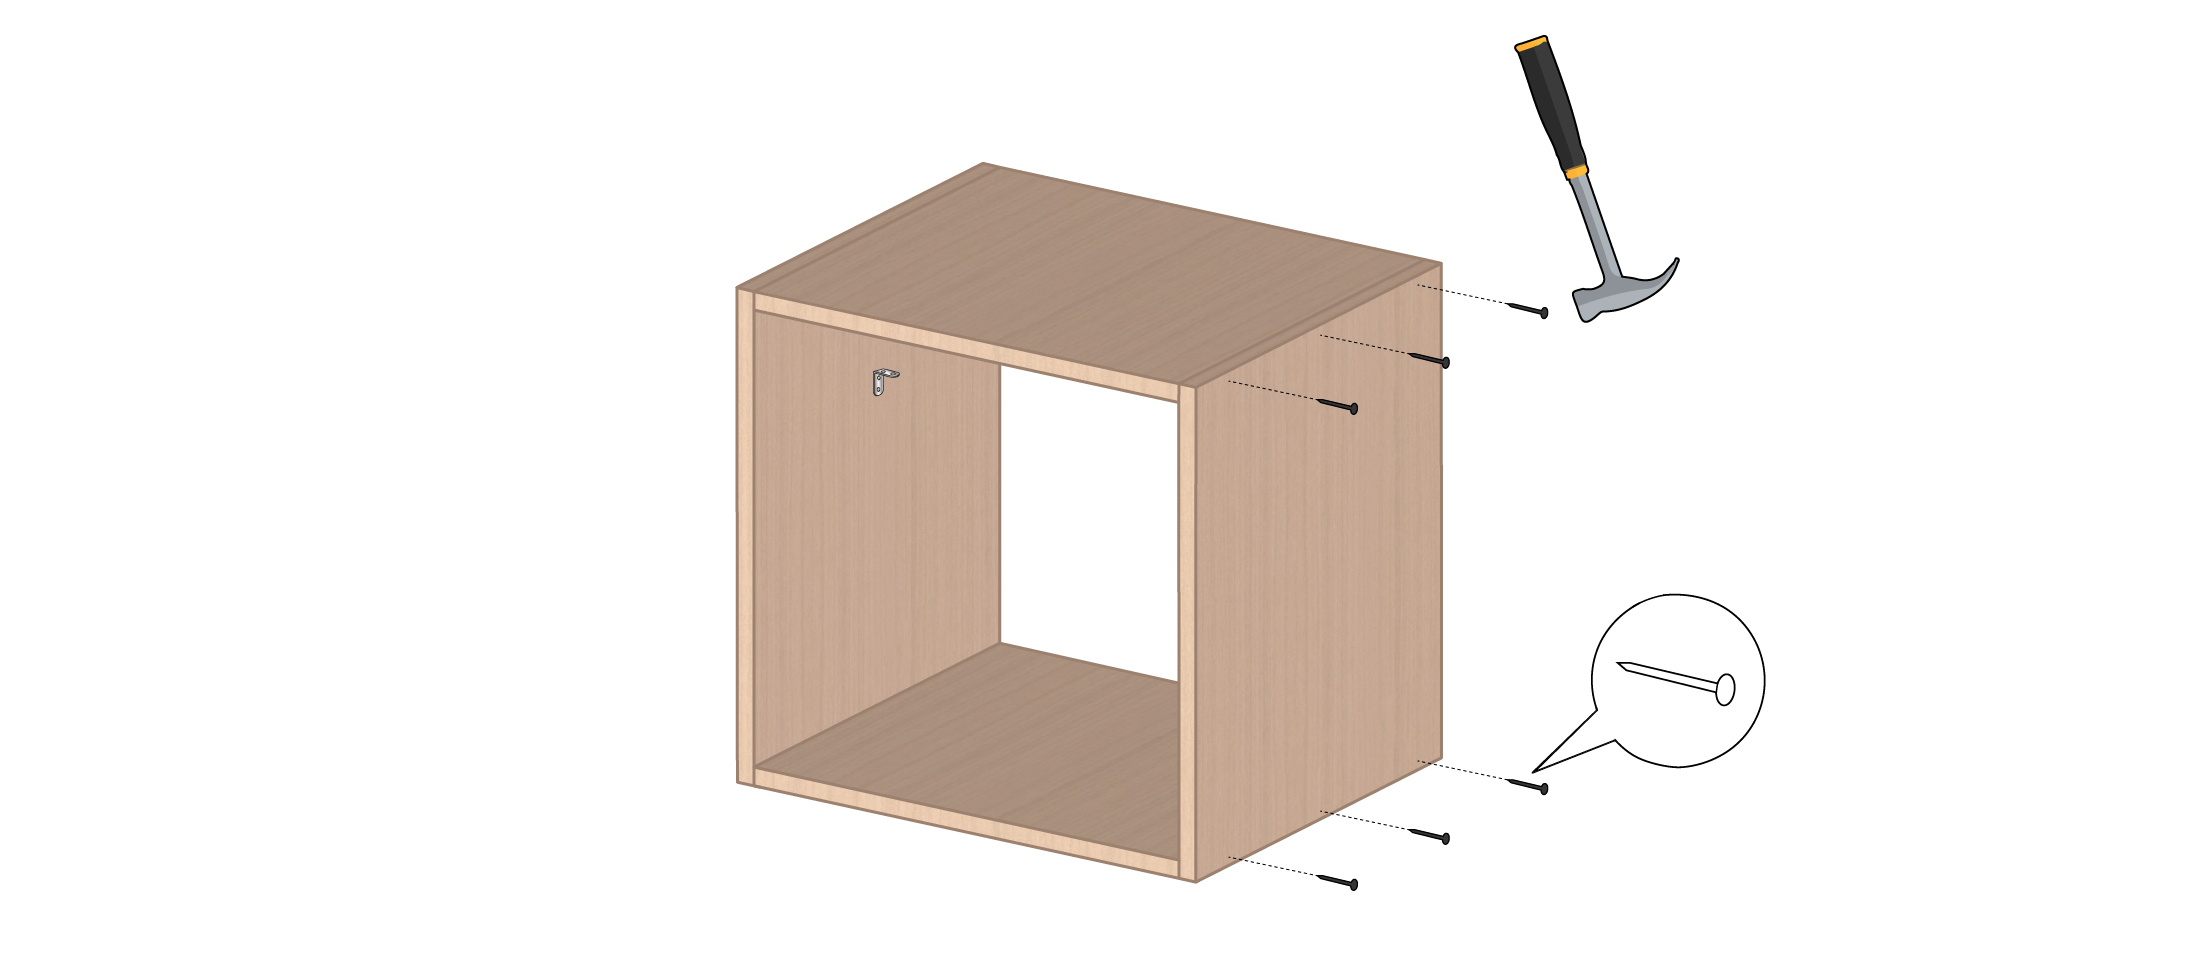 meuble vinyle DIY étape 3